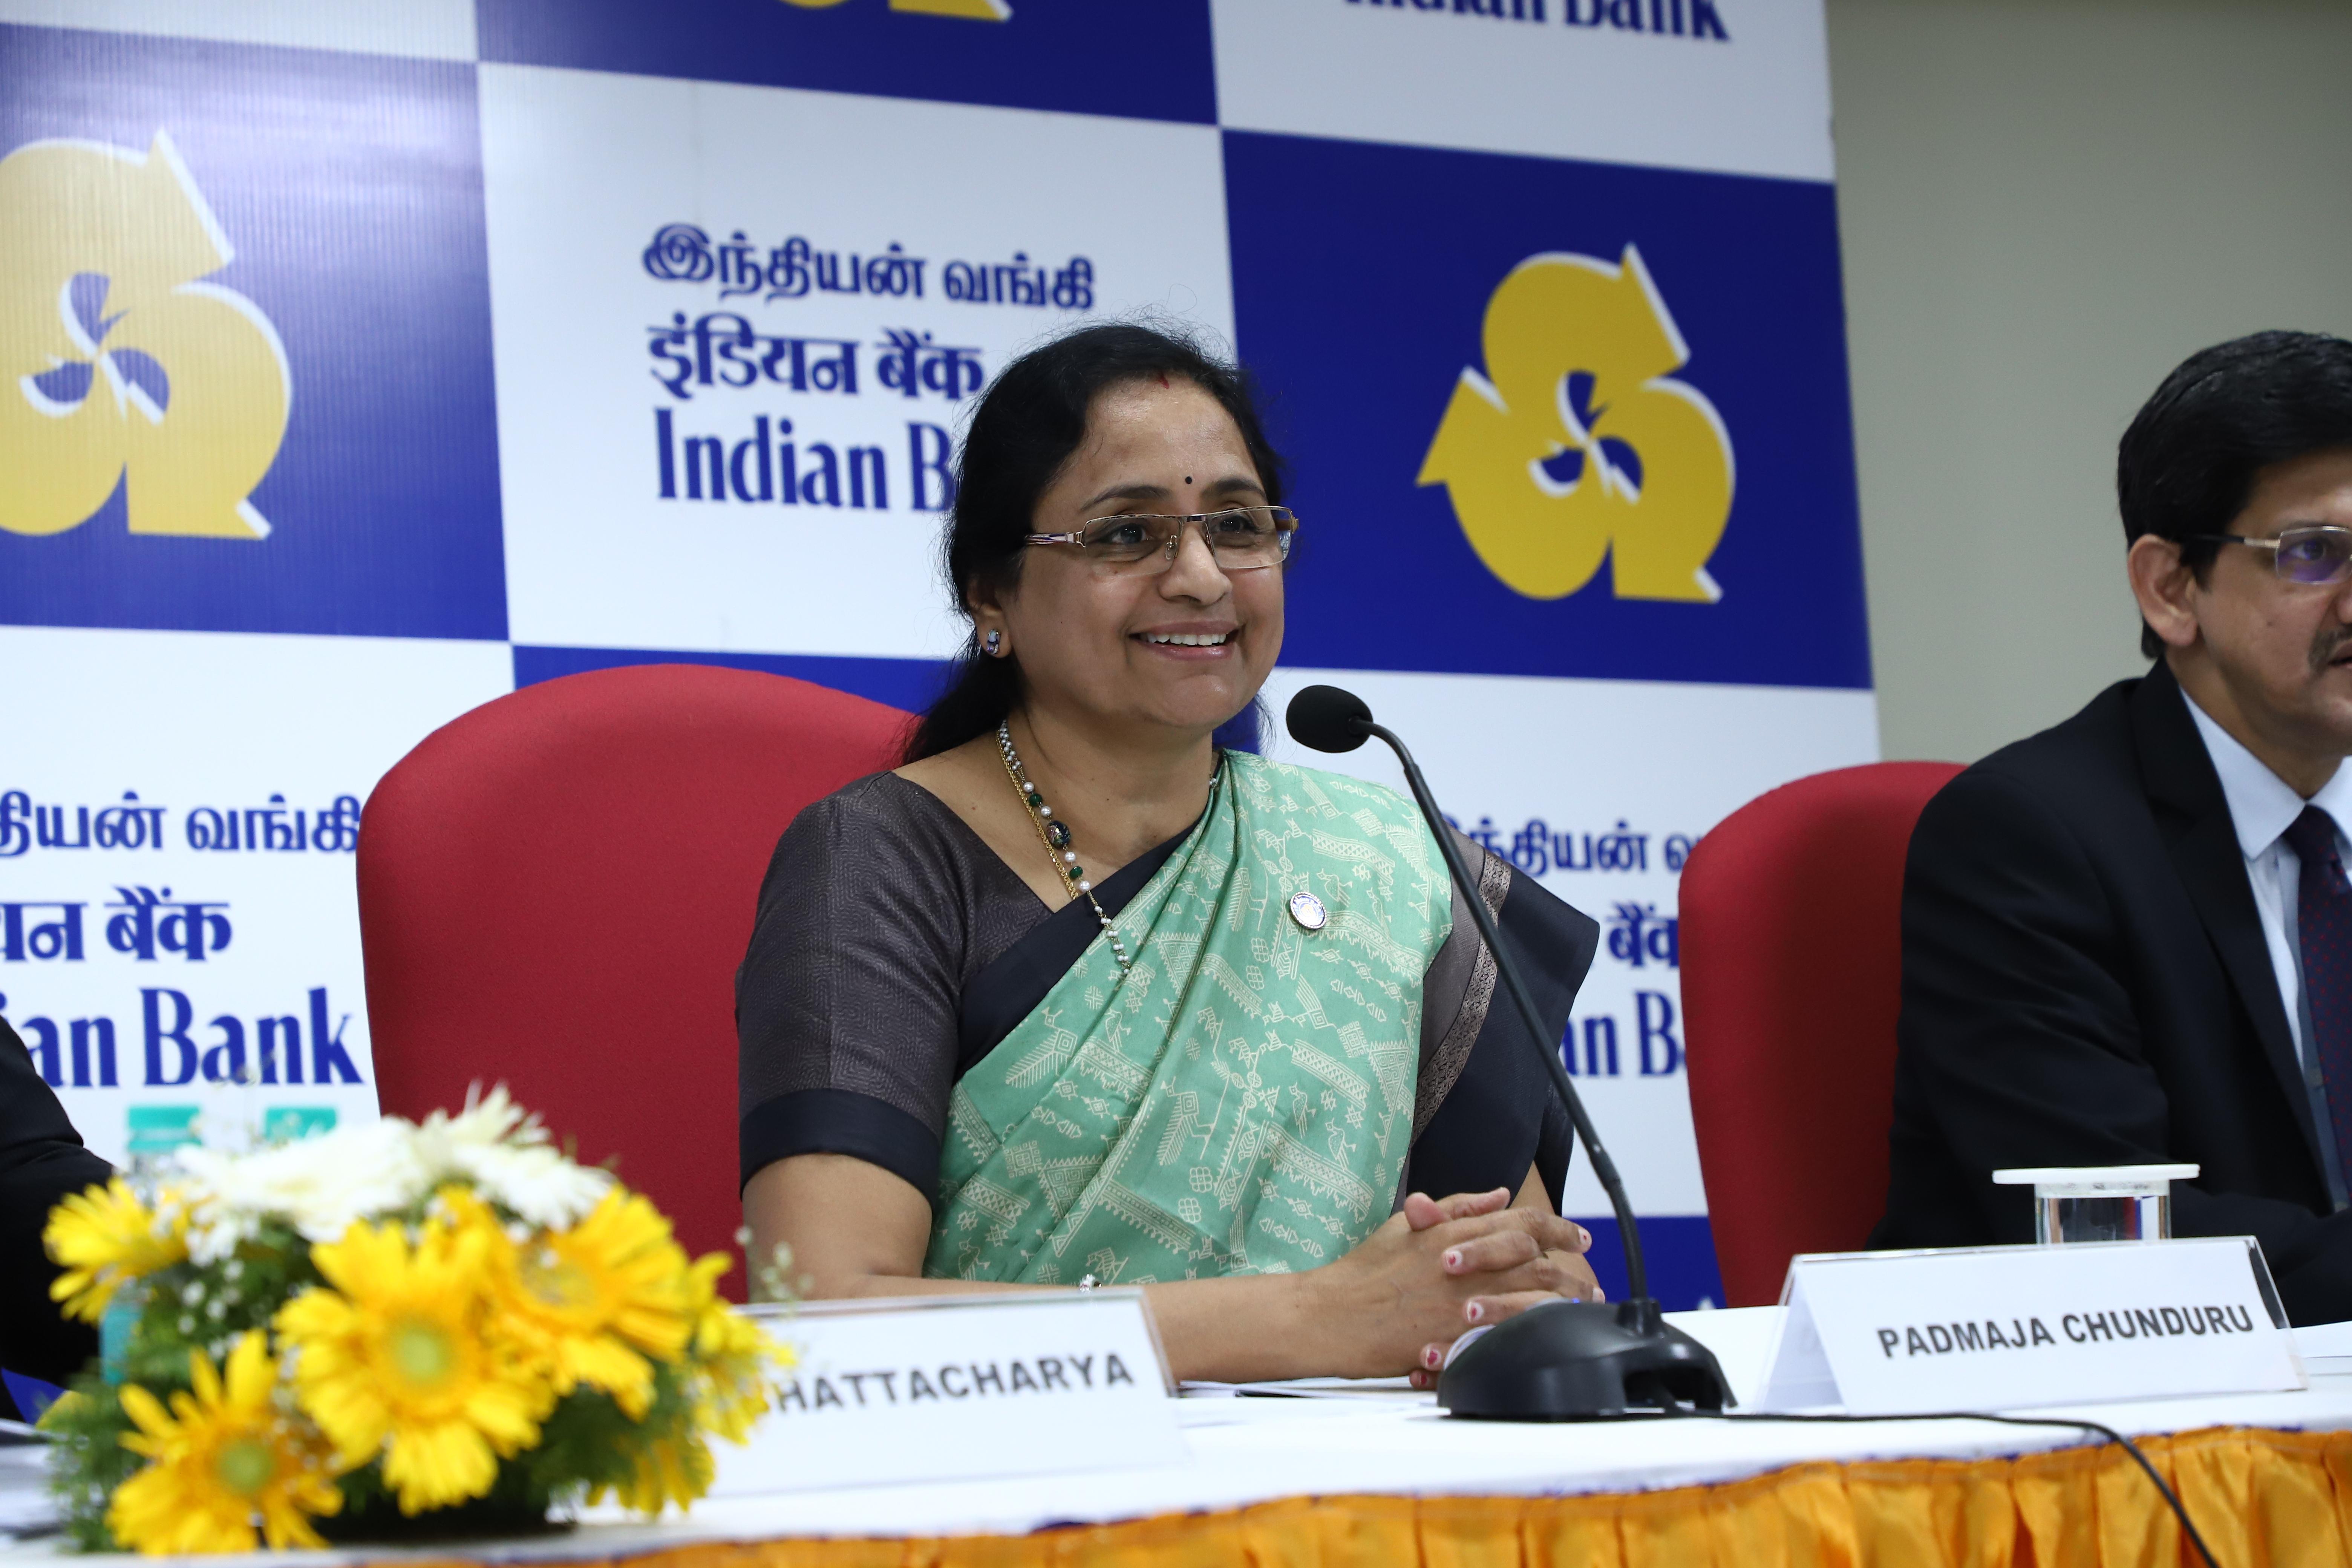 Ms. Padmaja Chunduru, MD & CEO of Indian Bank